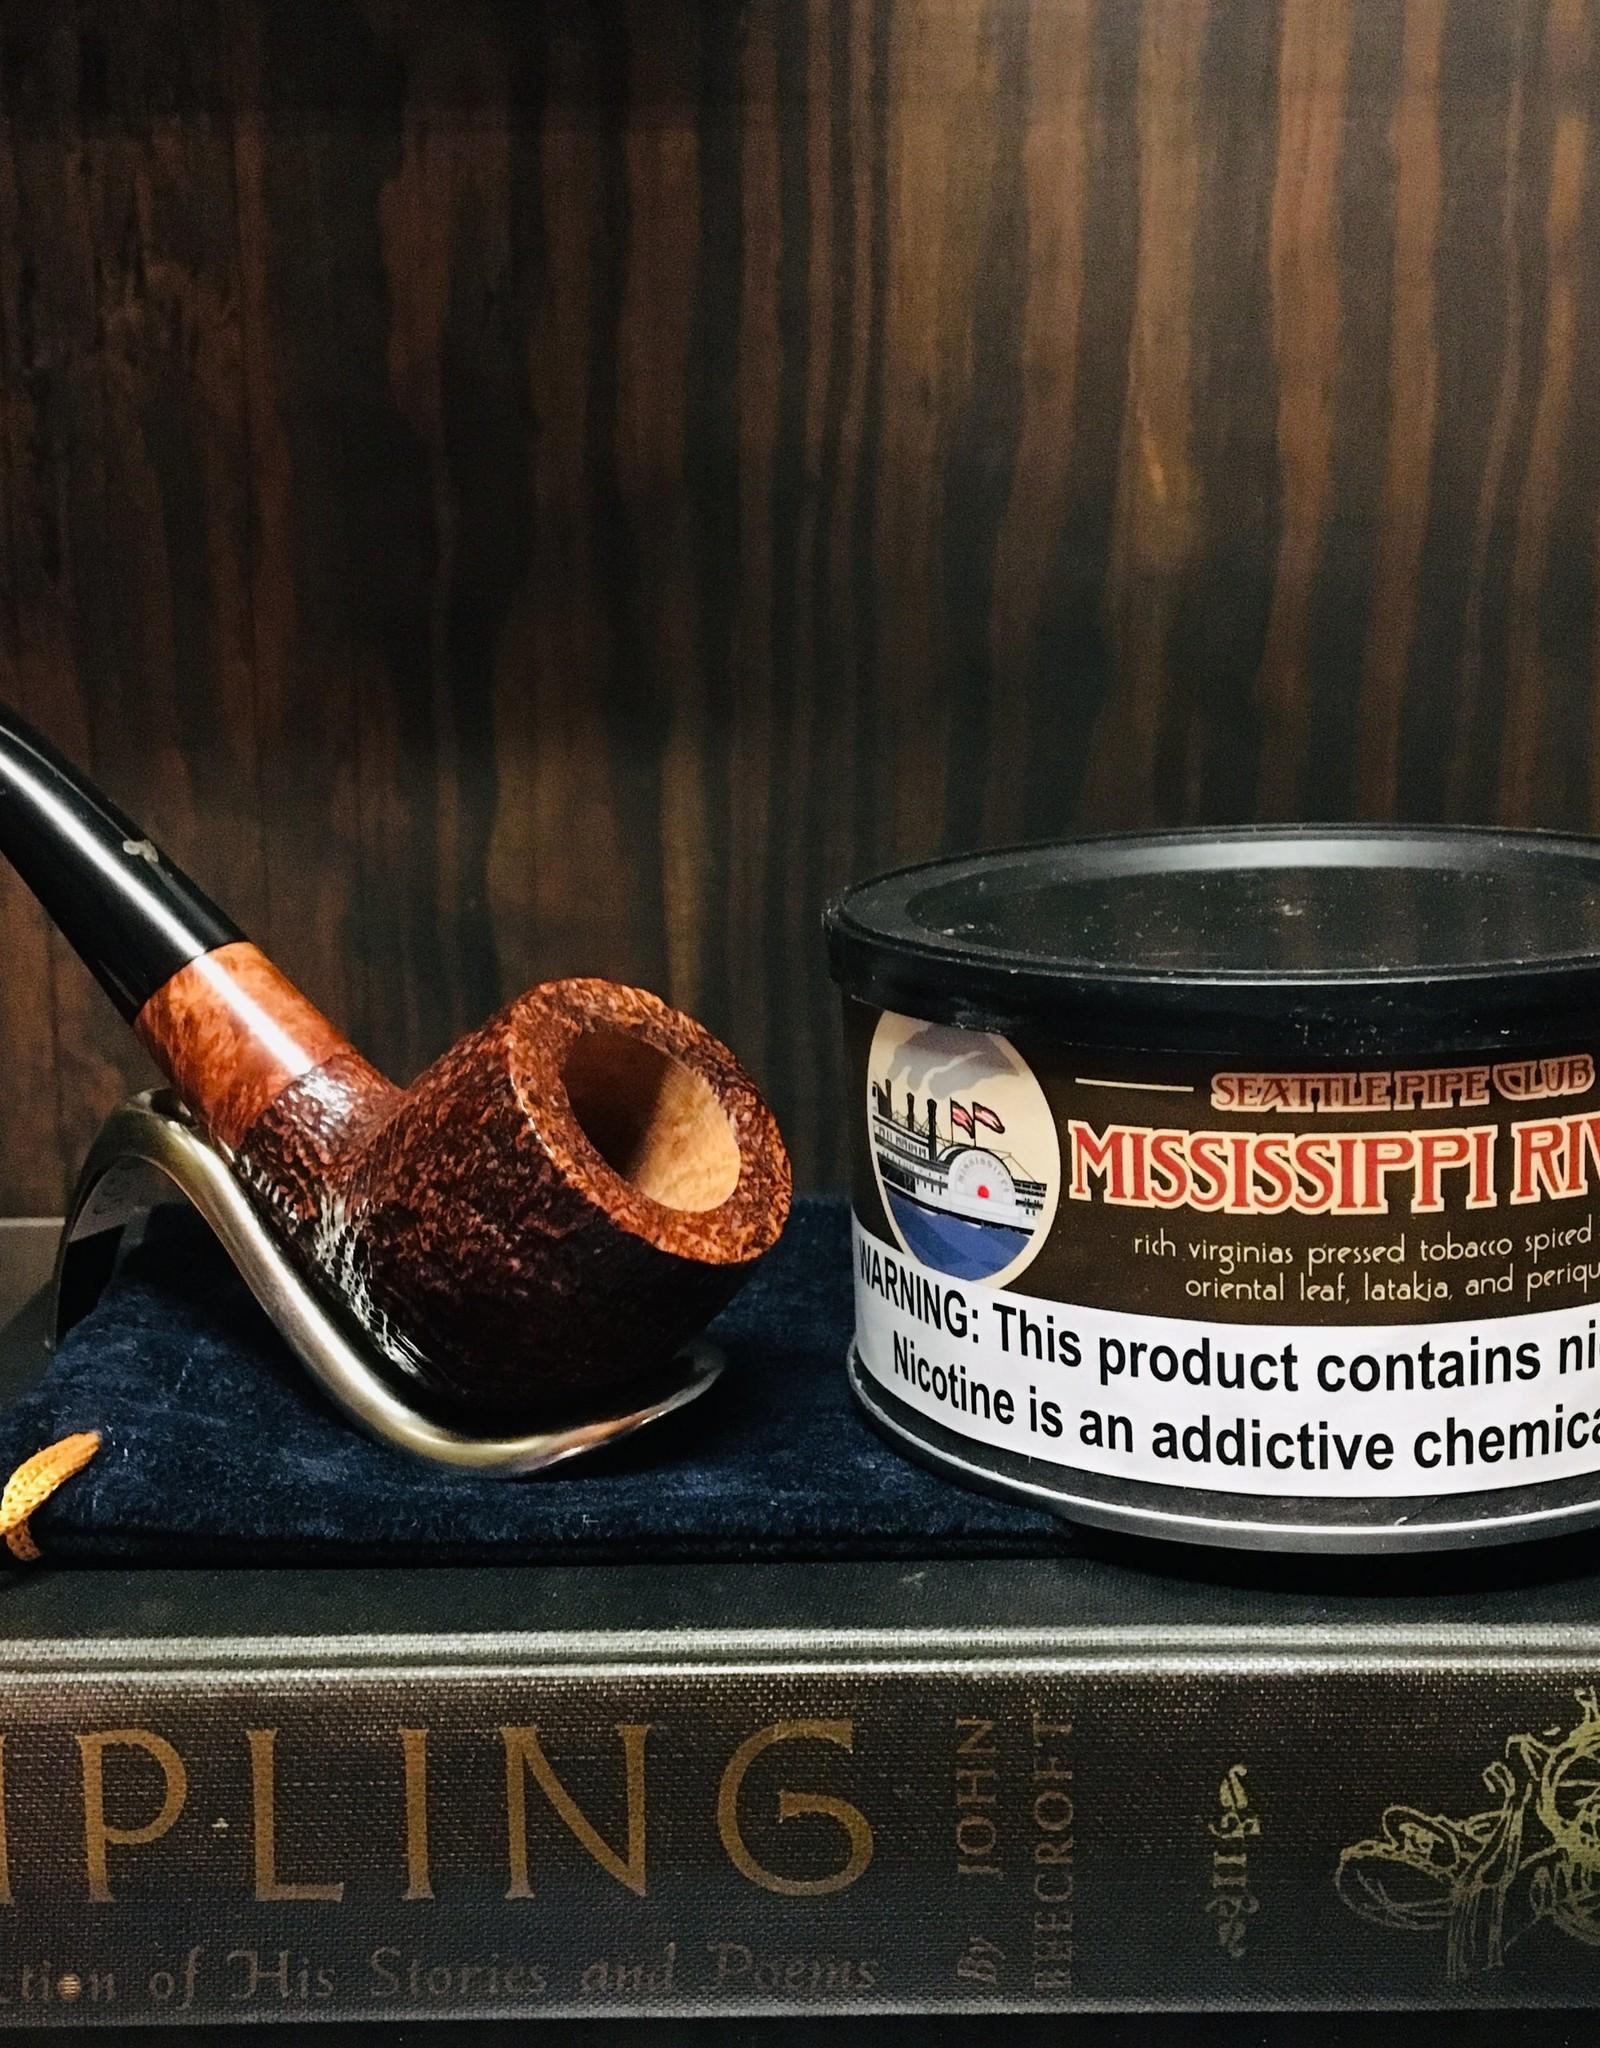 Seattle Pipe Club Seattle Pipe Club Pipe Tobacco Mississippi River 2oz